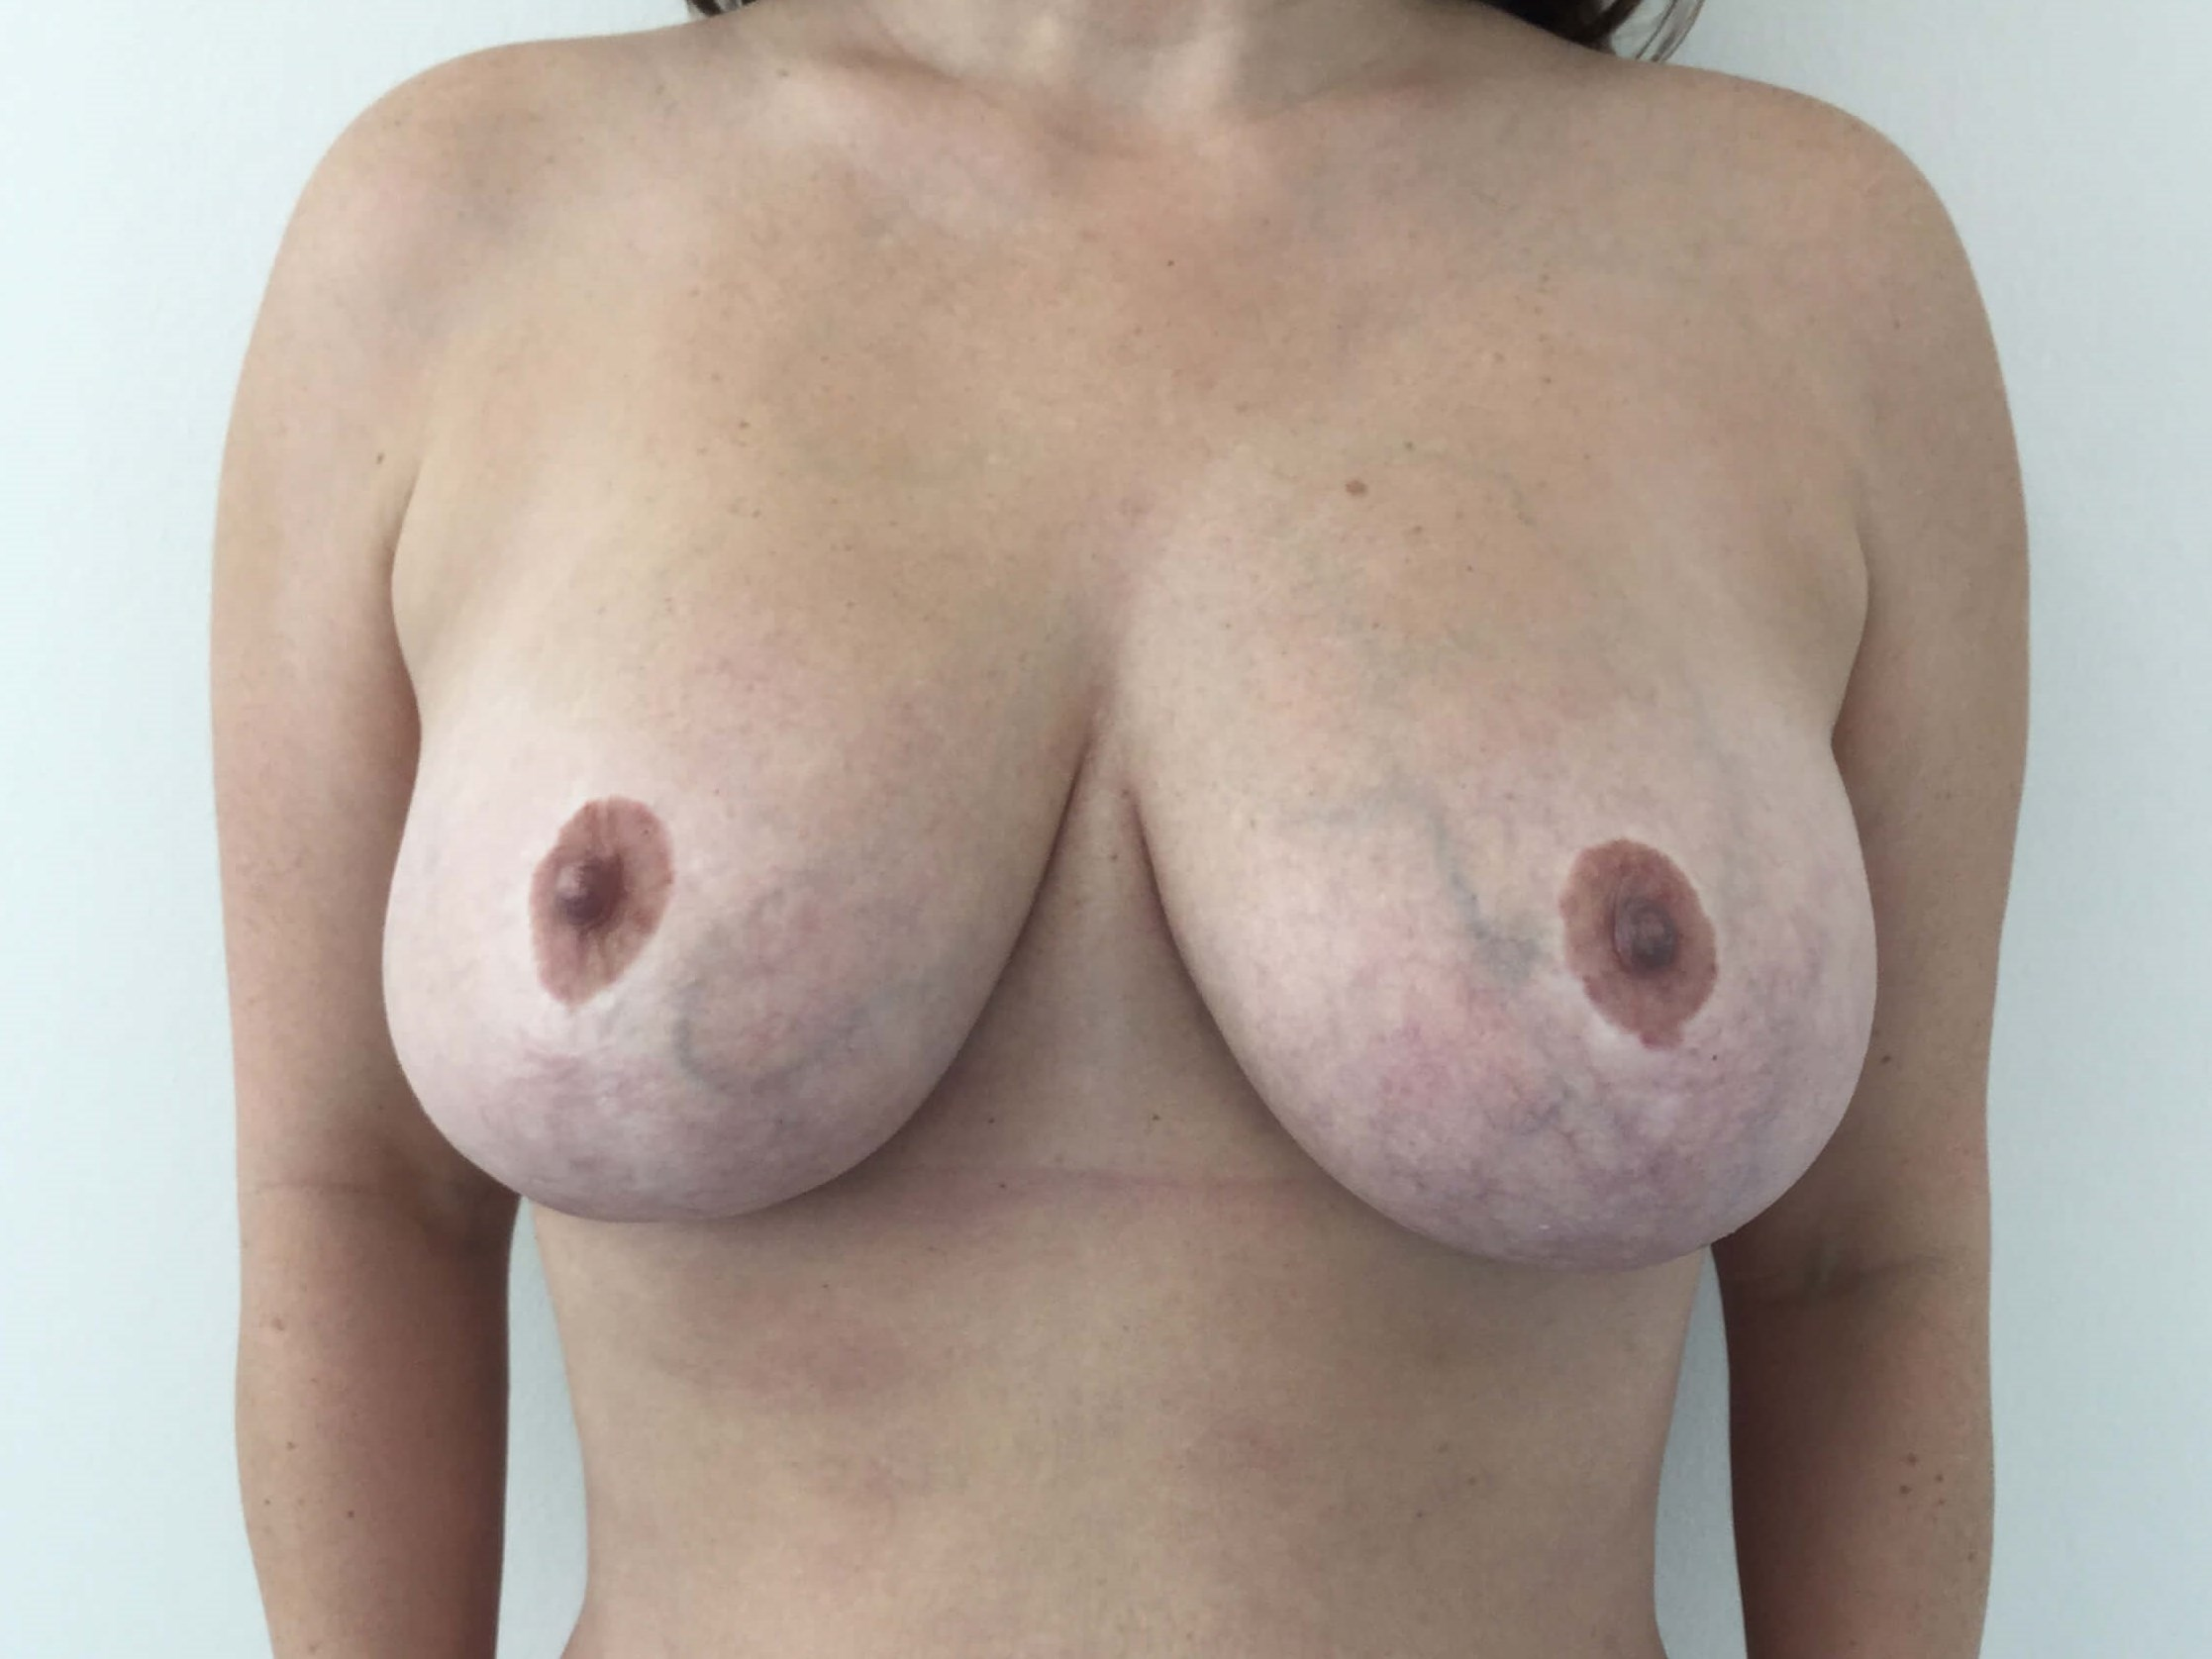 DALLAS TEXAS WOMAN HAS BREAST REDUCTION SURGERY